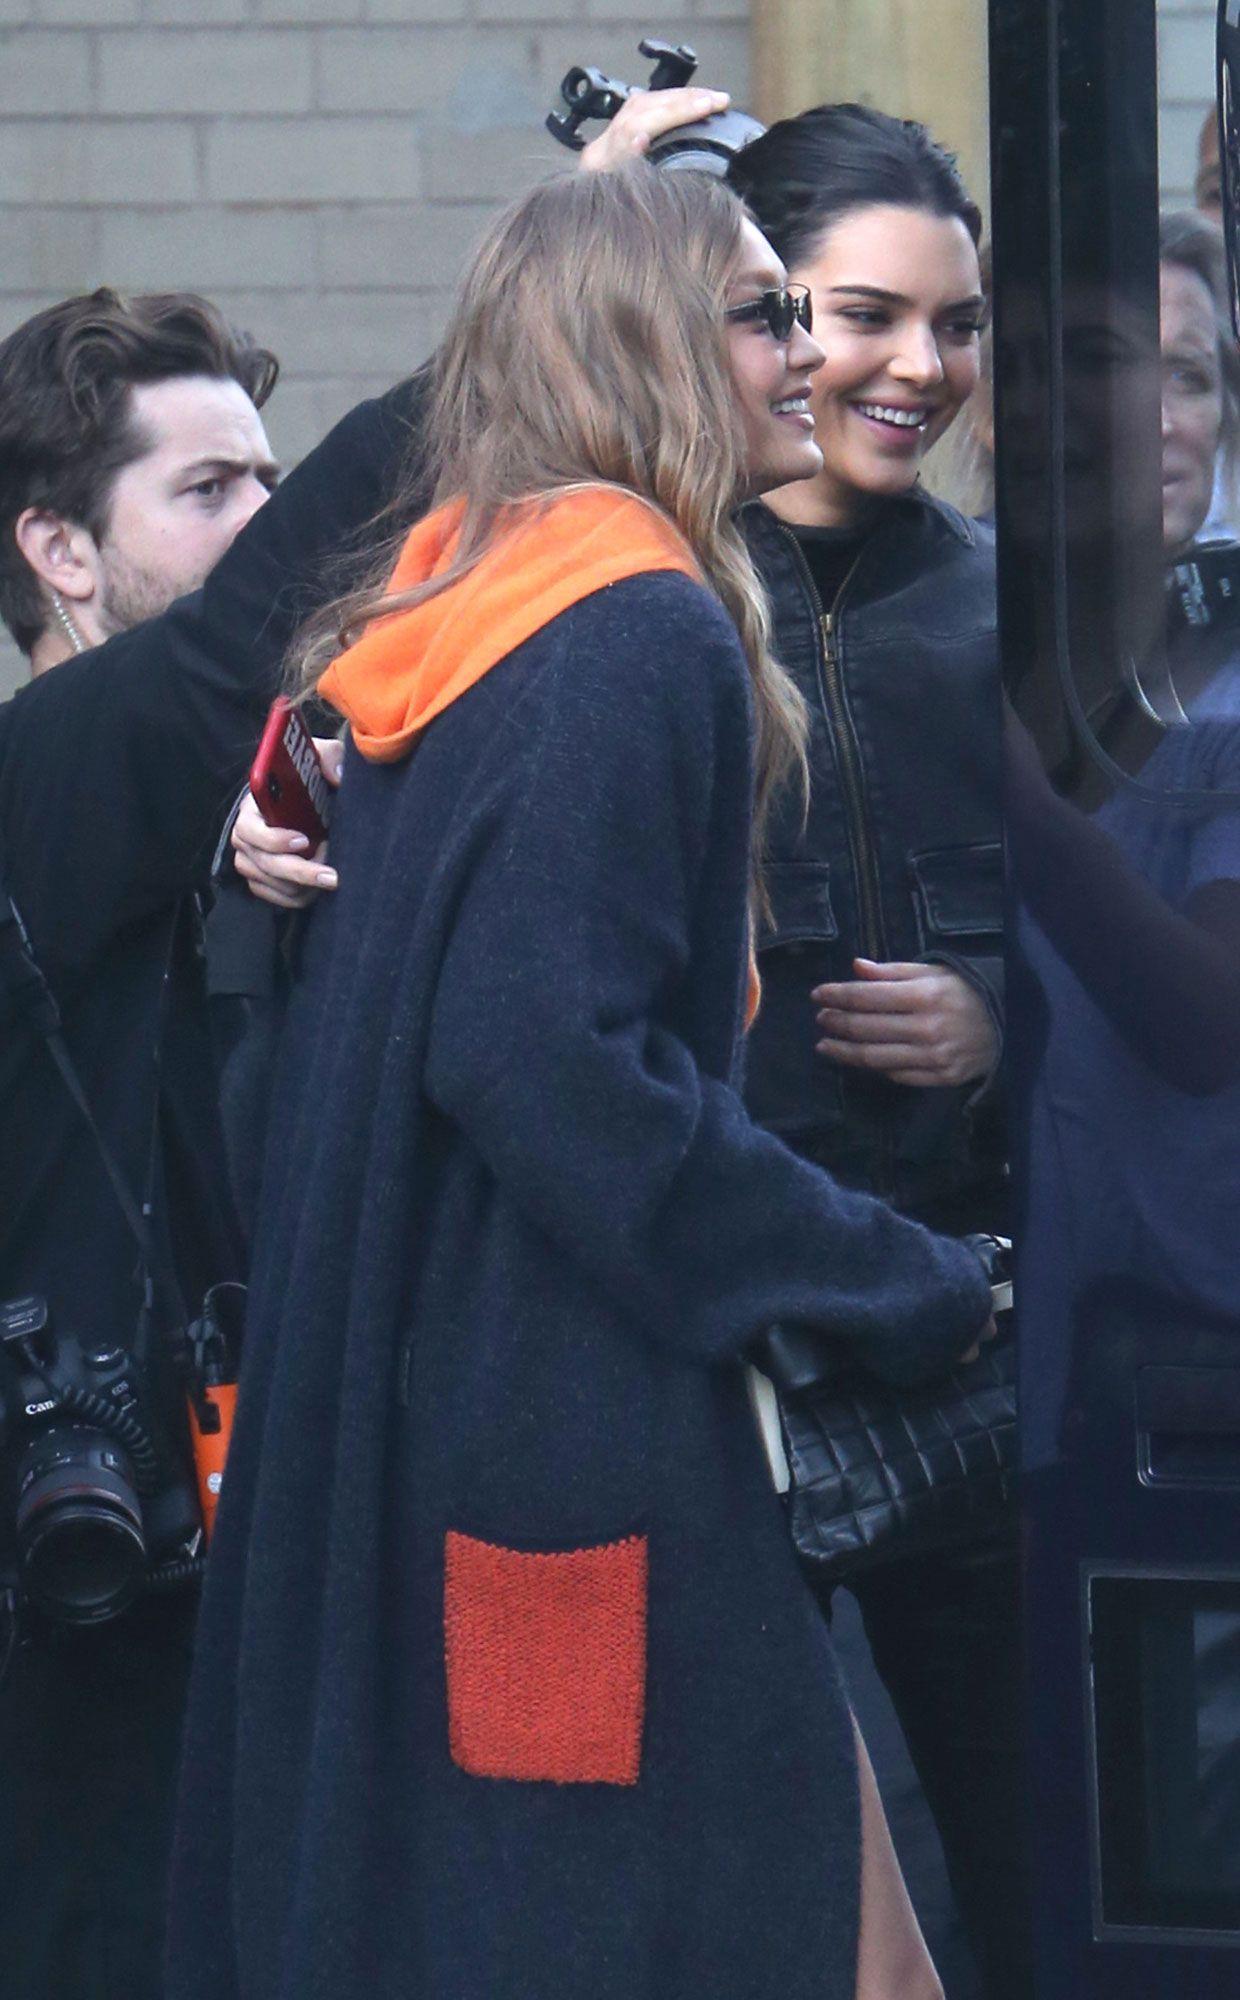 Gigi Hadid and Kendall Jenner Hug at Victoria's Secret Fashion Show Rehearsals After Skipping the 2017 Show – Bilgi